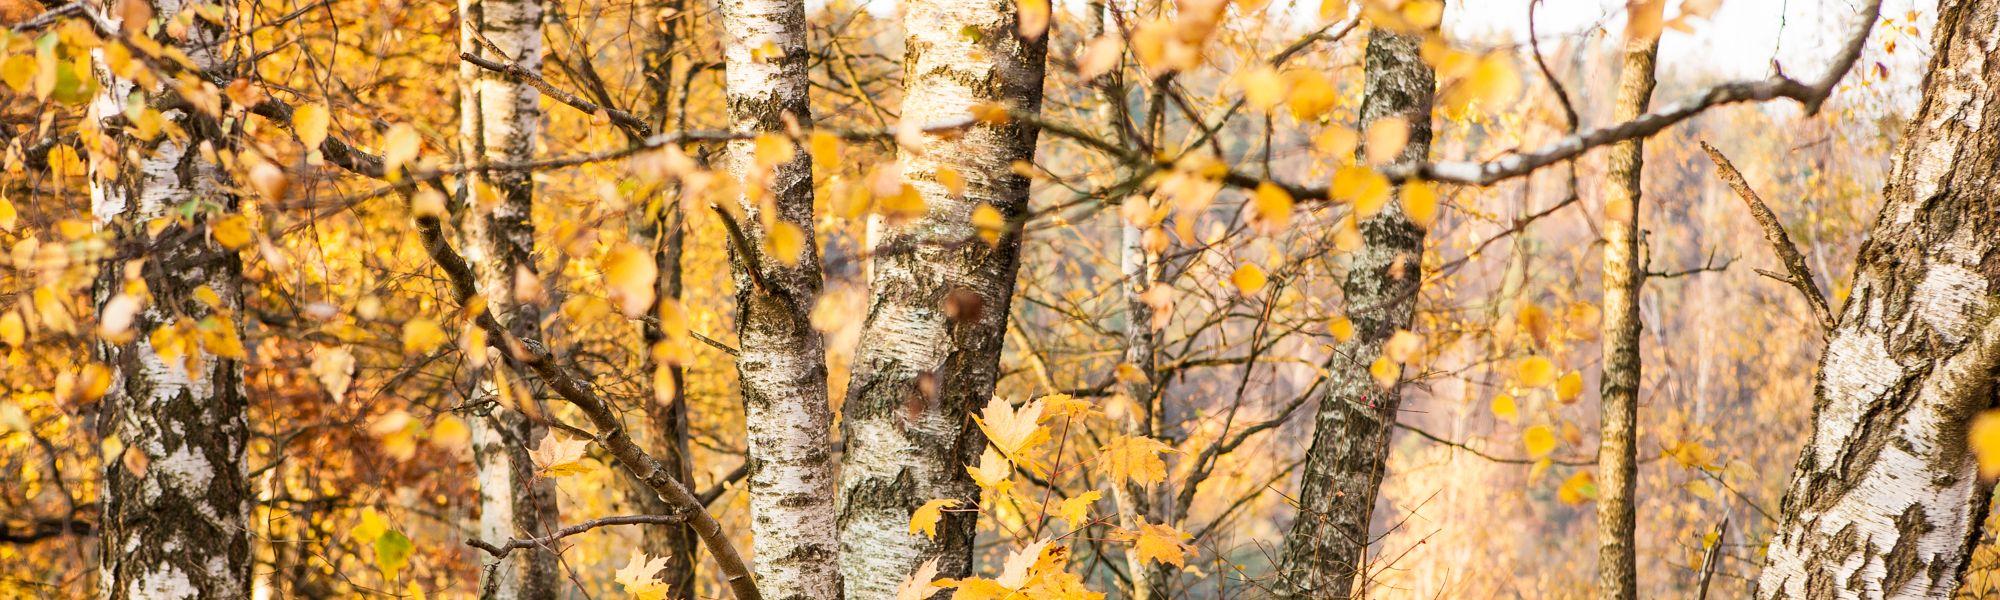 Las Brzozowy, Brzoza brodawkowata (Betula pendula)